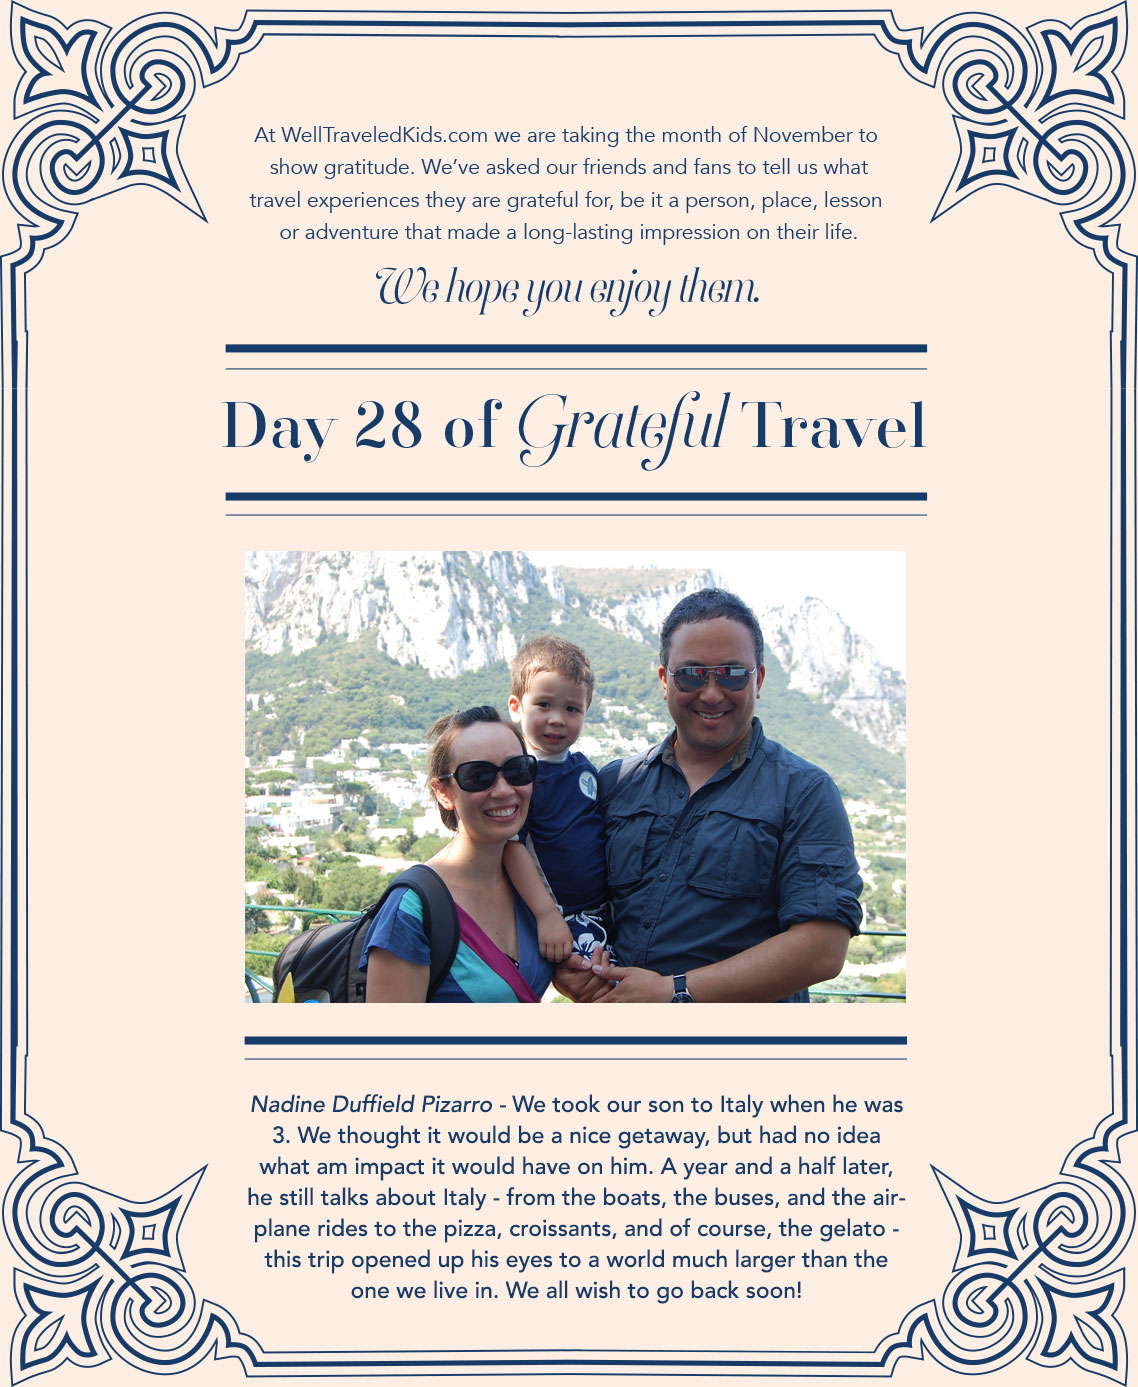 GratefulTravel_Day_28